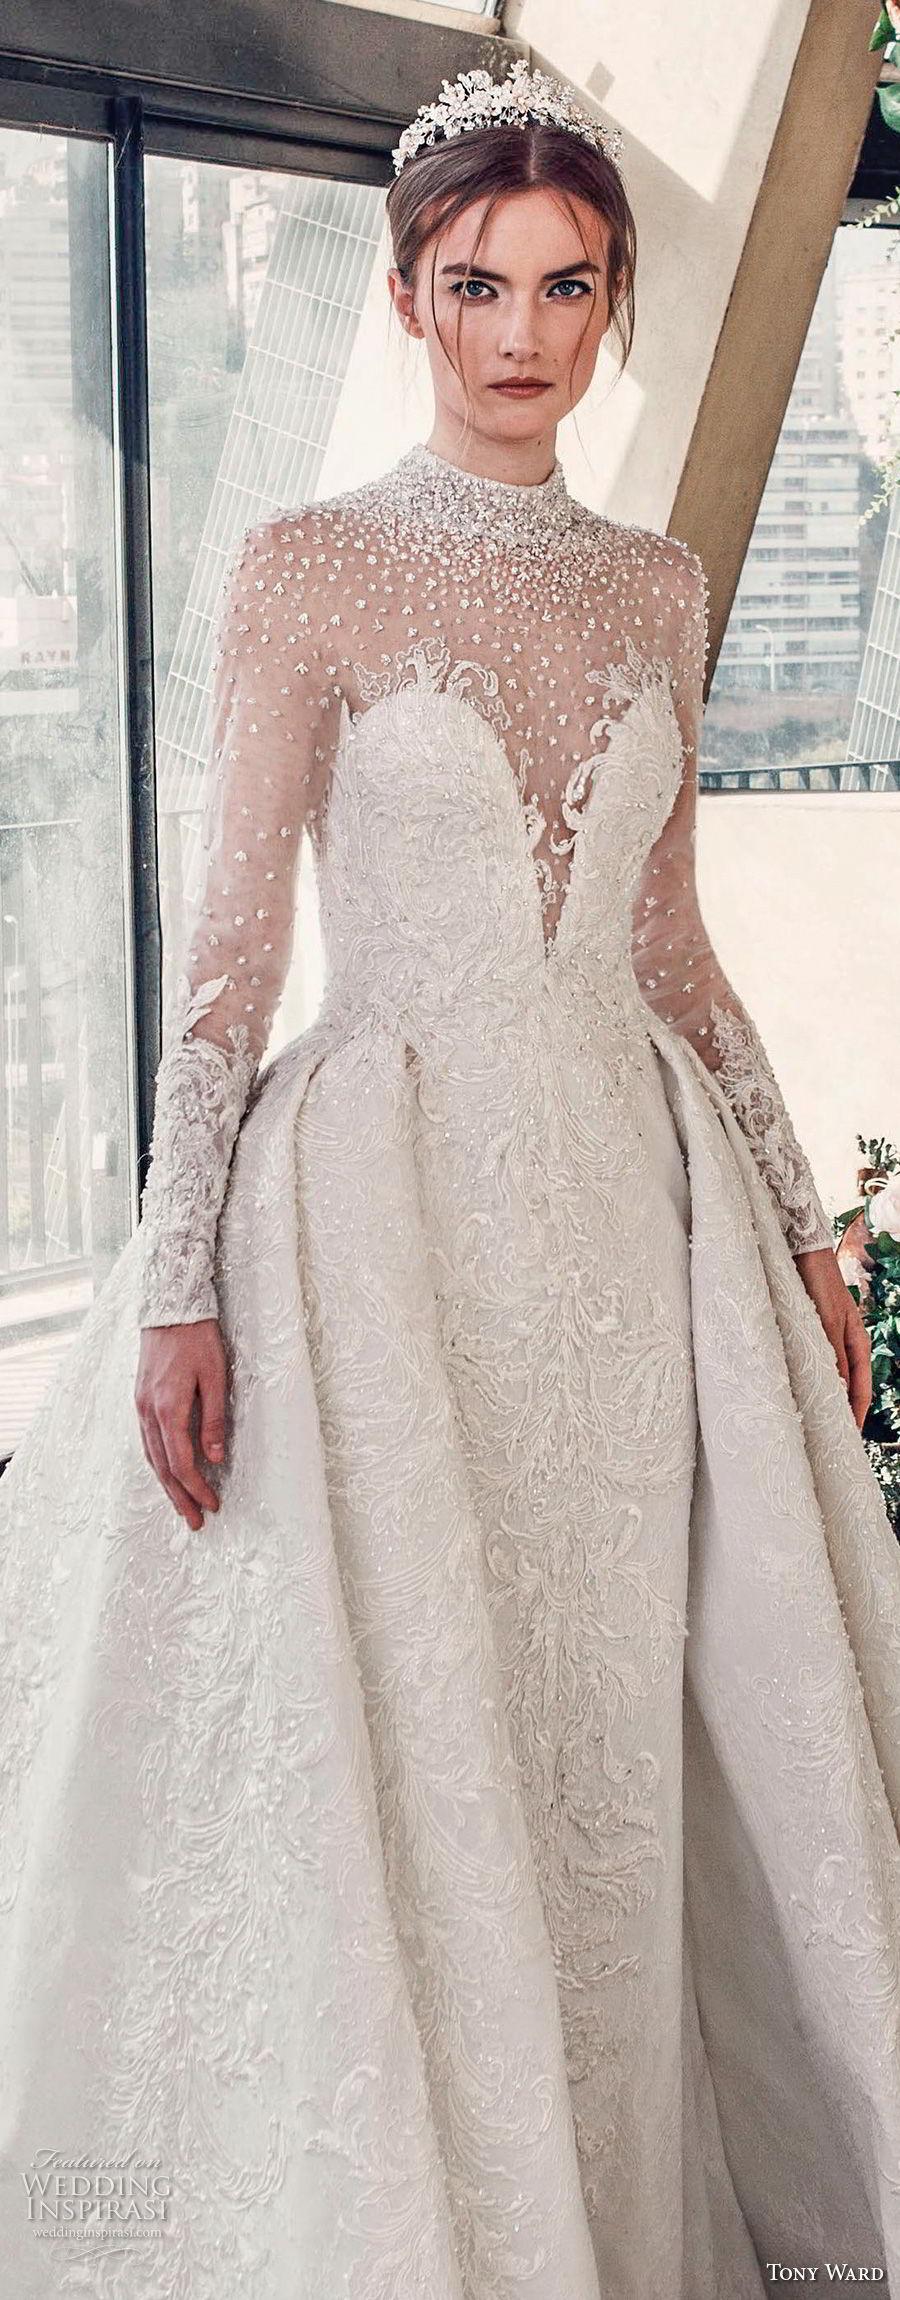 tony ward mariee 2019 long sleeves illusion high neck deep sweetheart neckline full embellishment princess ball gown a line wedding dress chapel train (3) zv